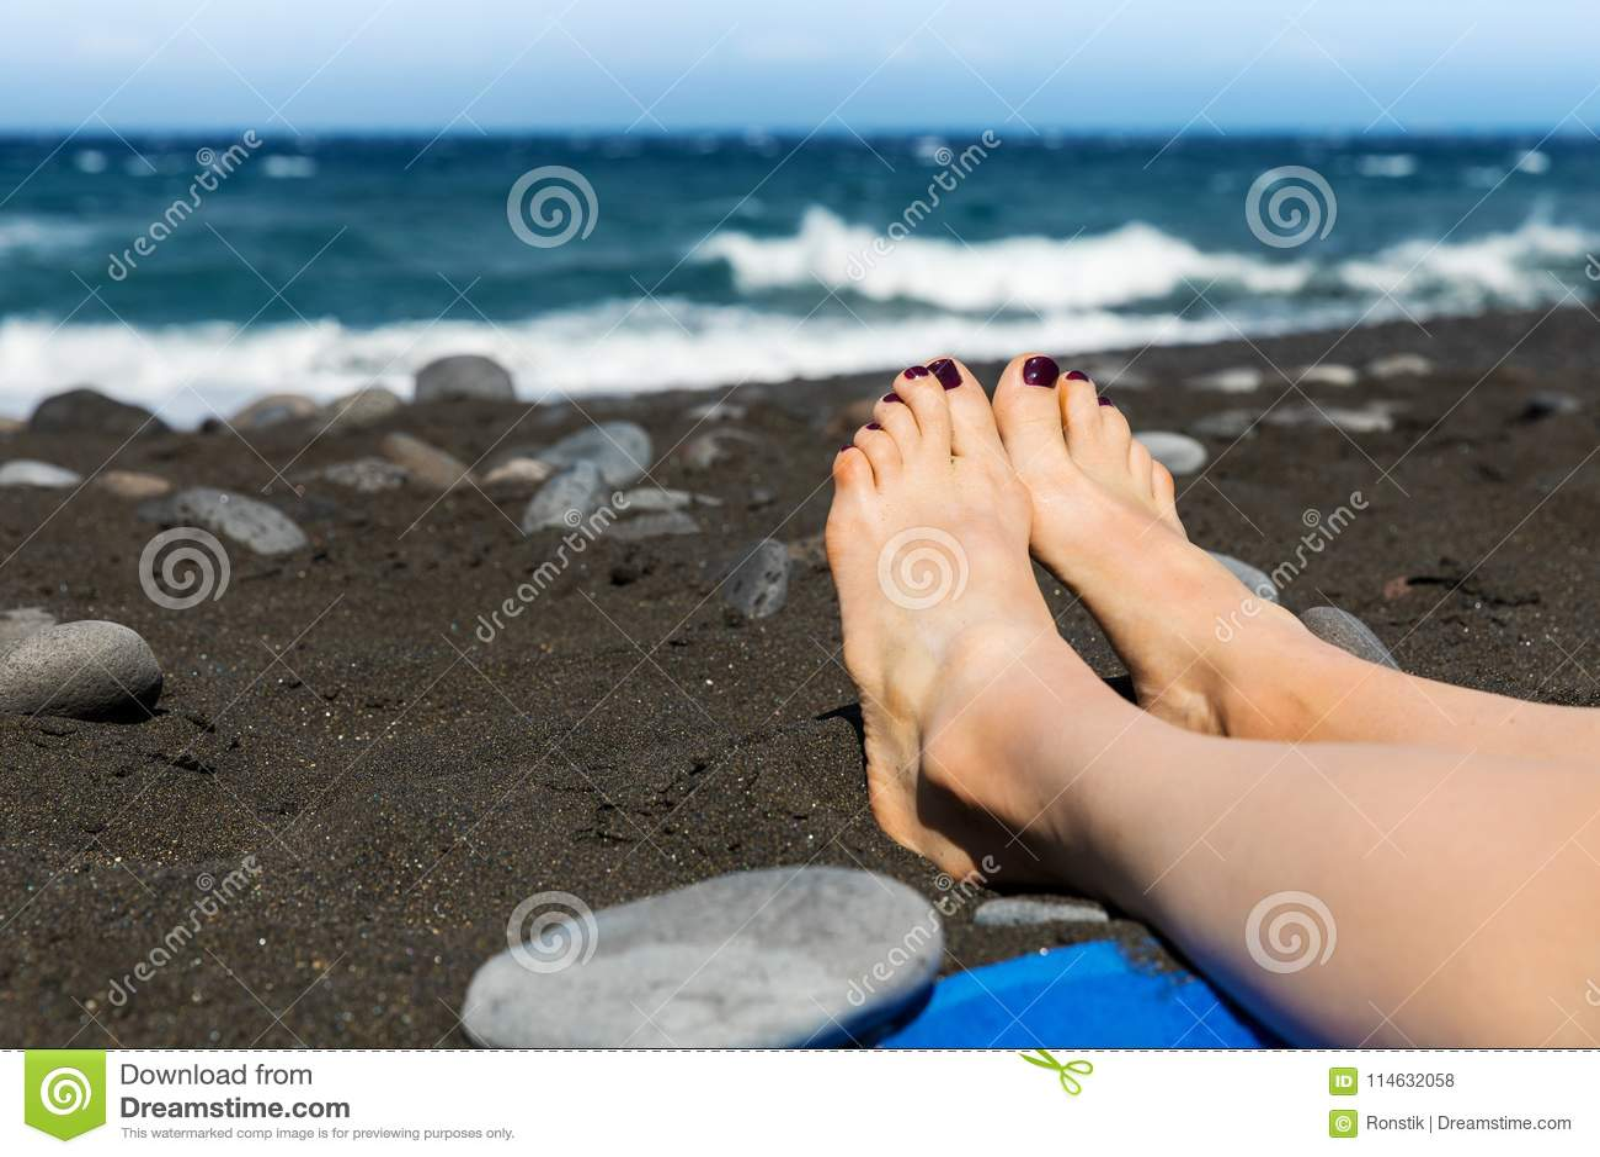 5320fd6ce5 Ηλιοθεραπεία - πόδια γυναικών στη μαύρη παραλία άμμου Στοκ Εικόνες ...